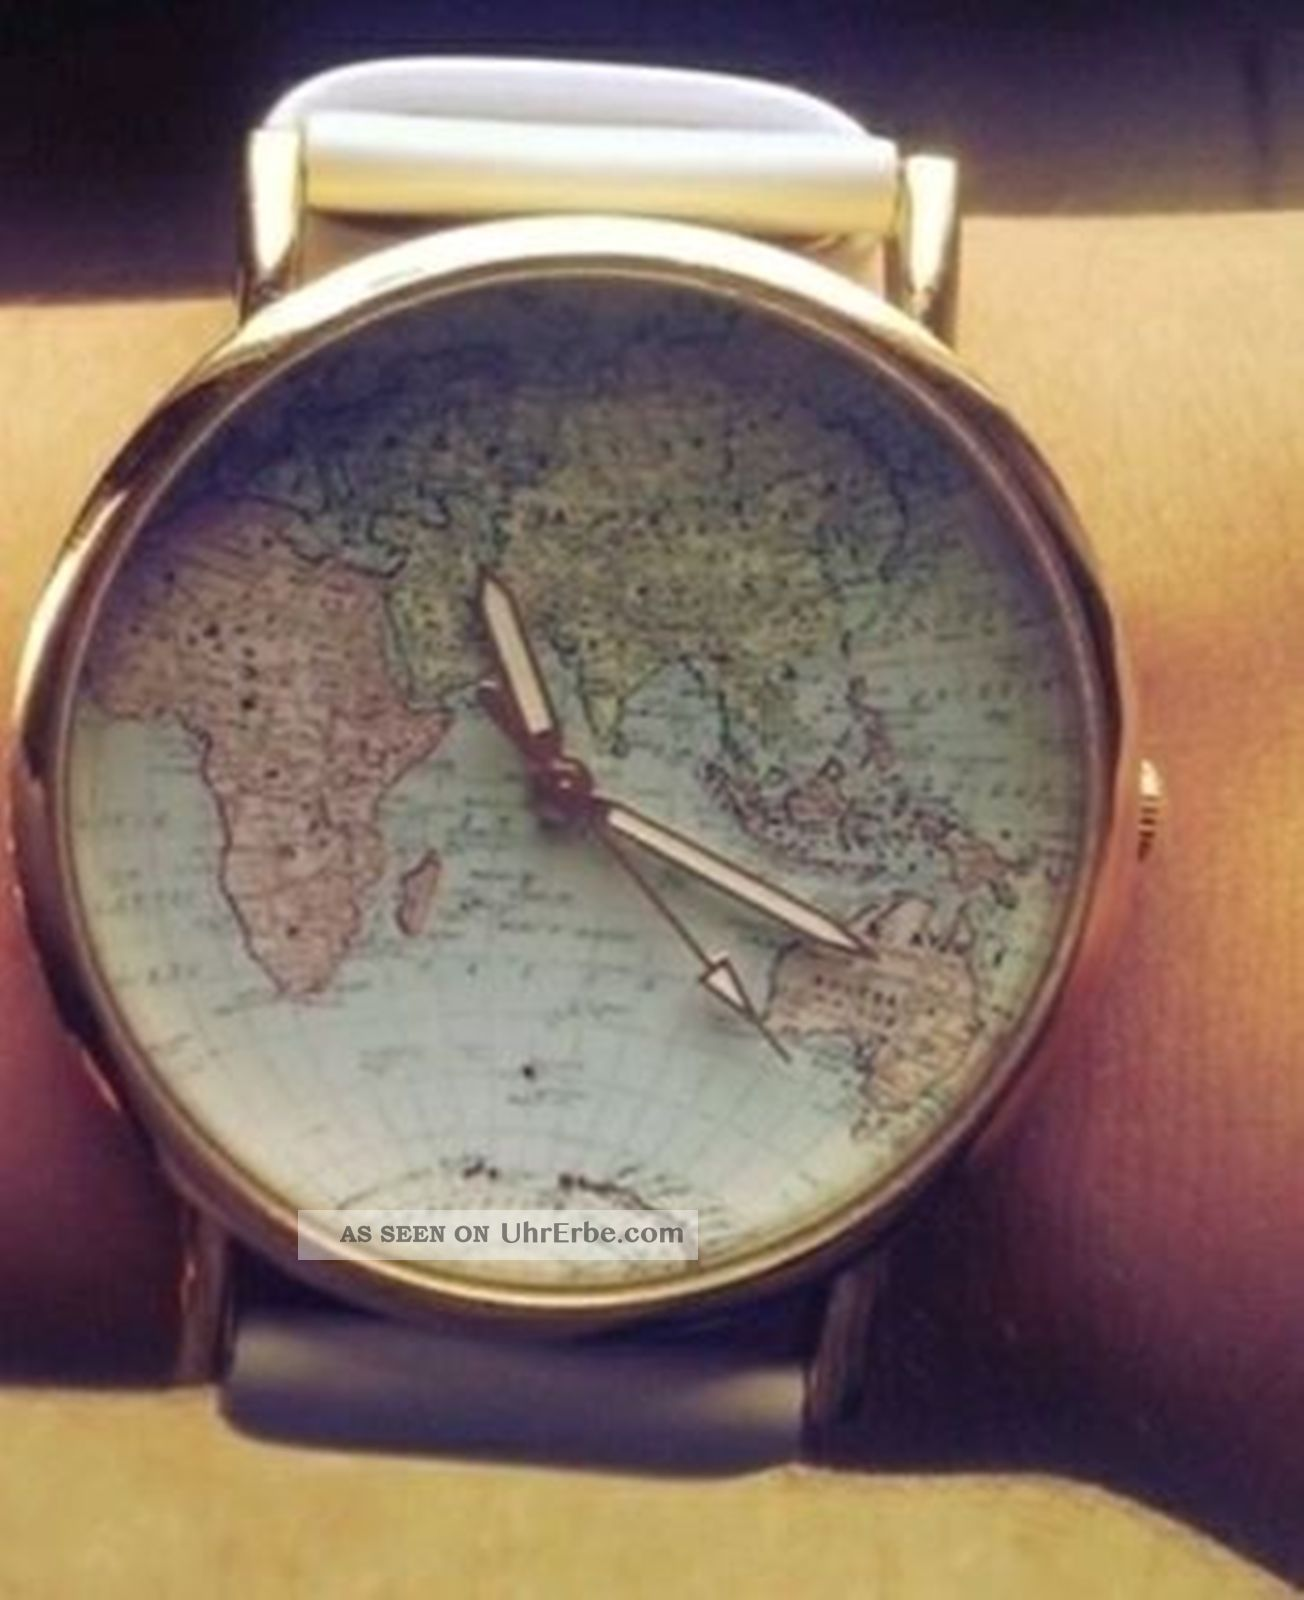 Damen Retro Blogger Uhr Armbanduhr Weiß Gold Mit Weltkarte Armbanduhren Bild